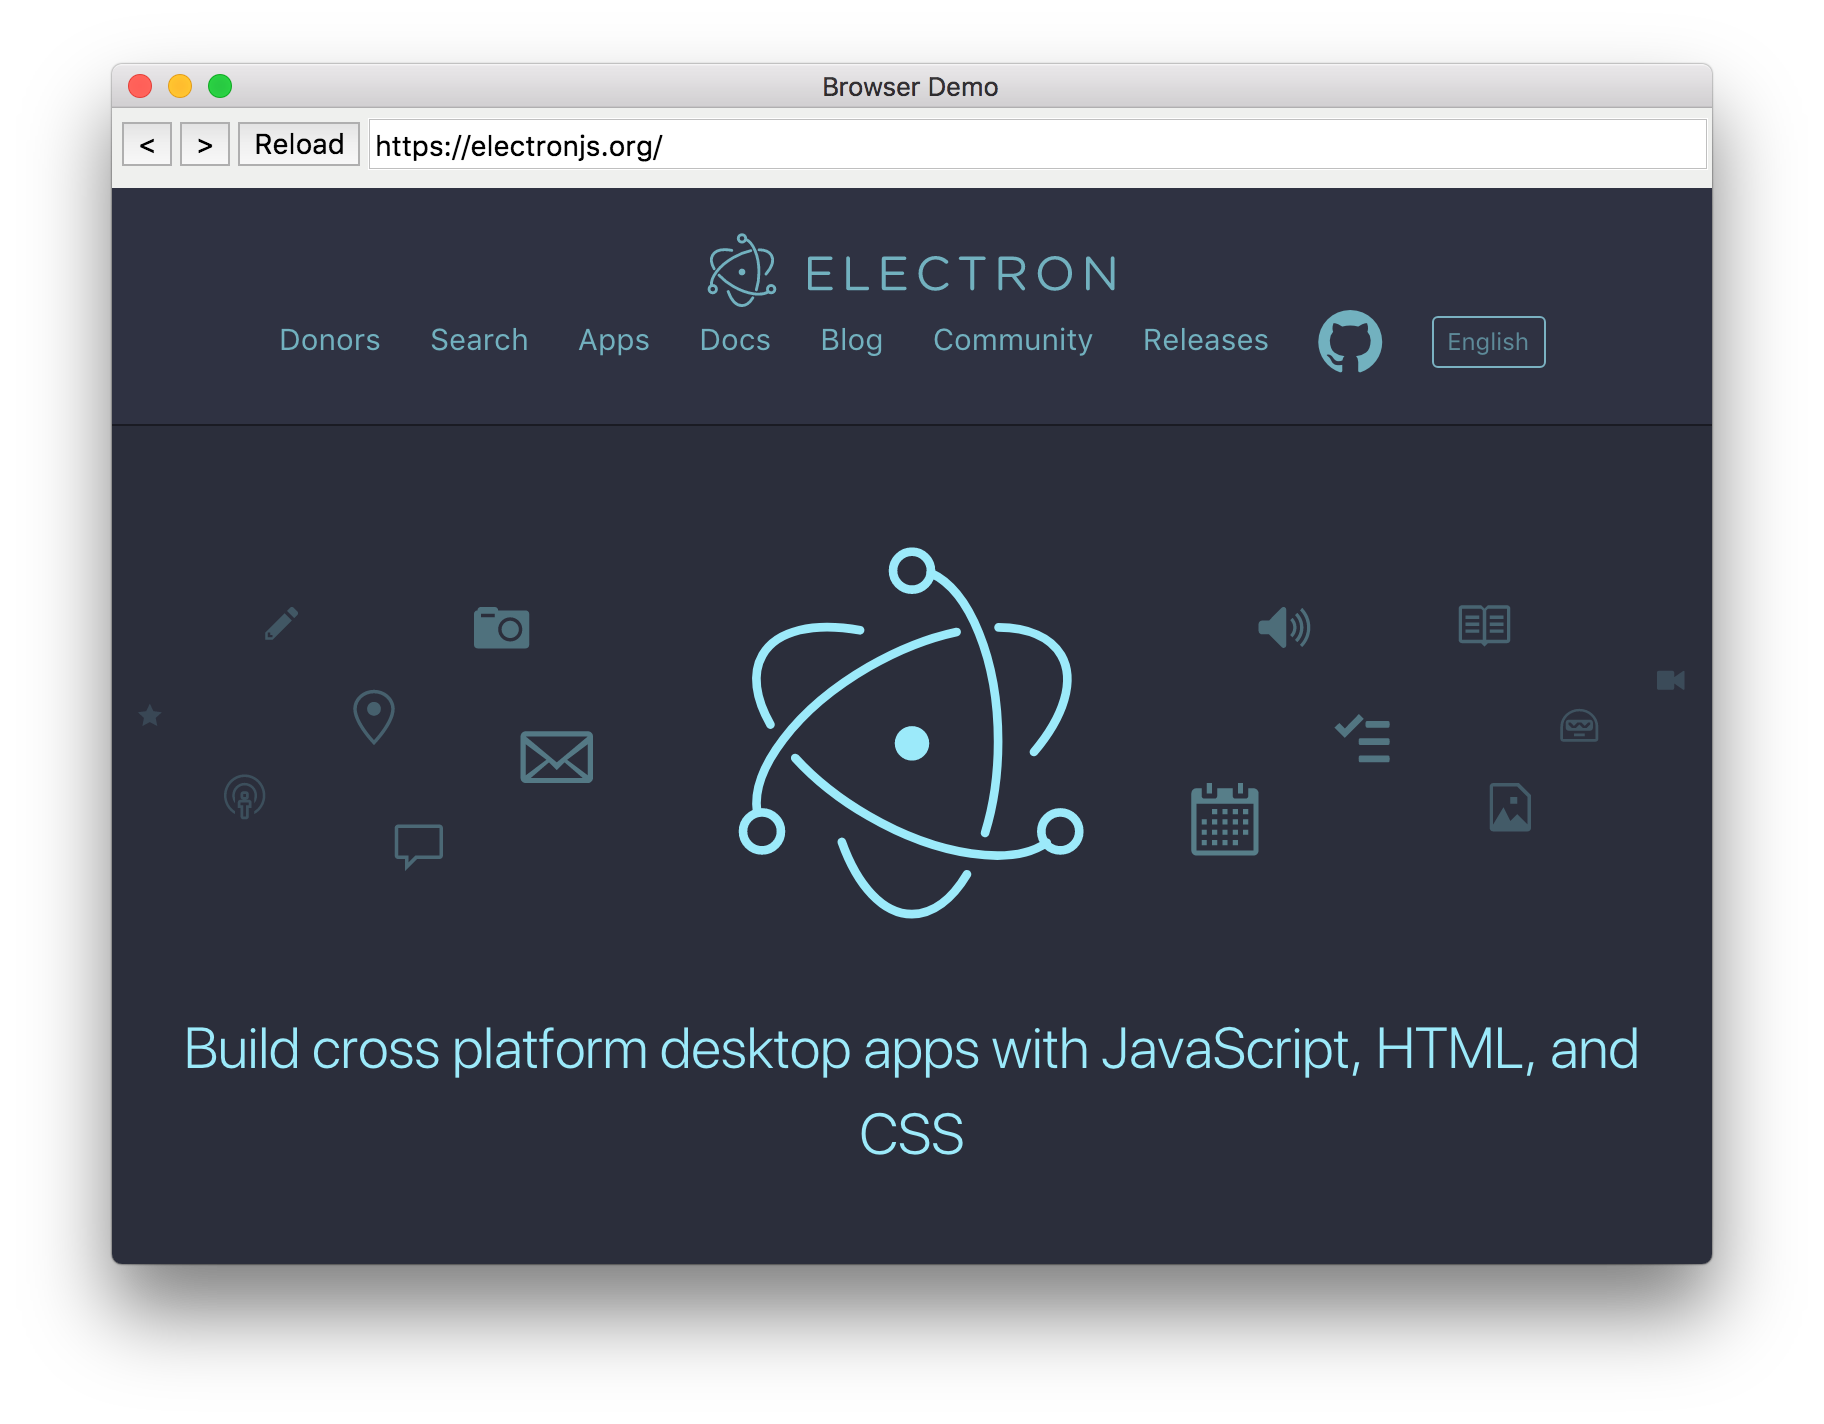 ScreenShot_Electron_01.png